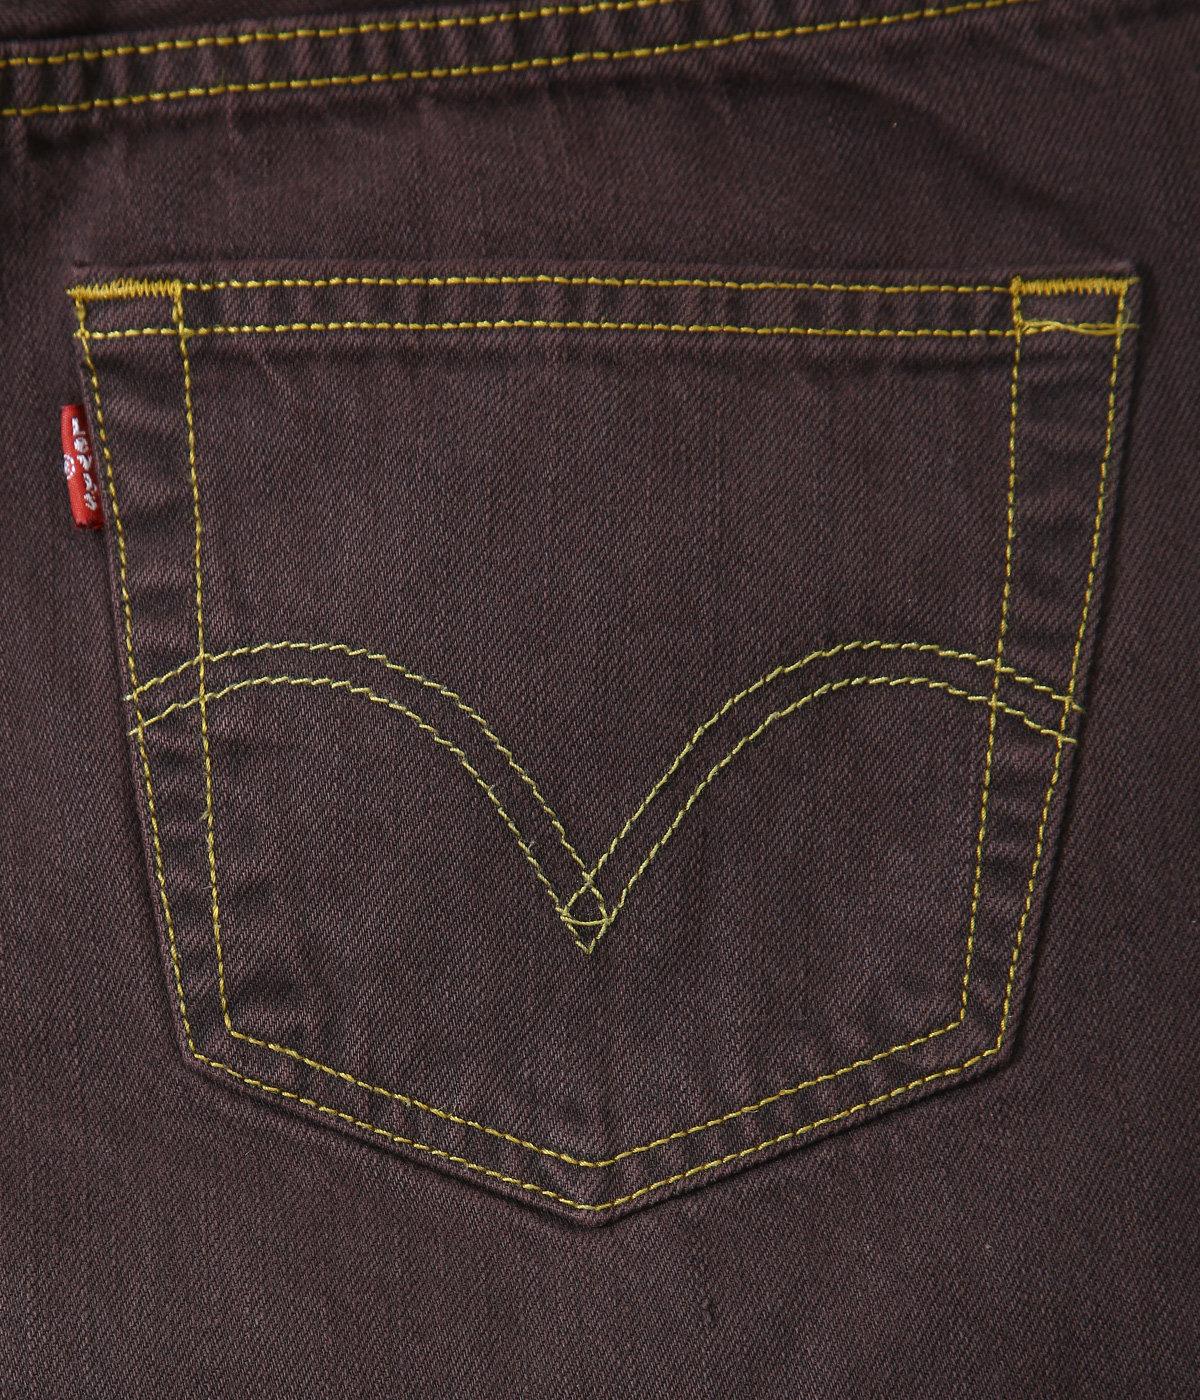 Skintone jeans